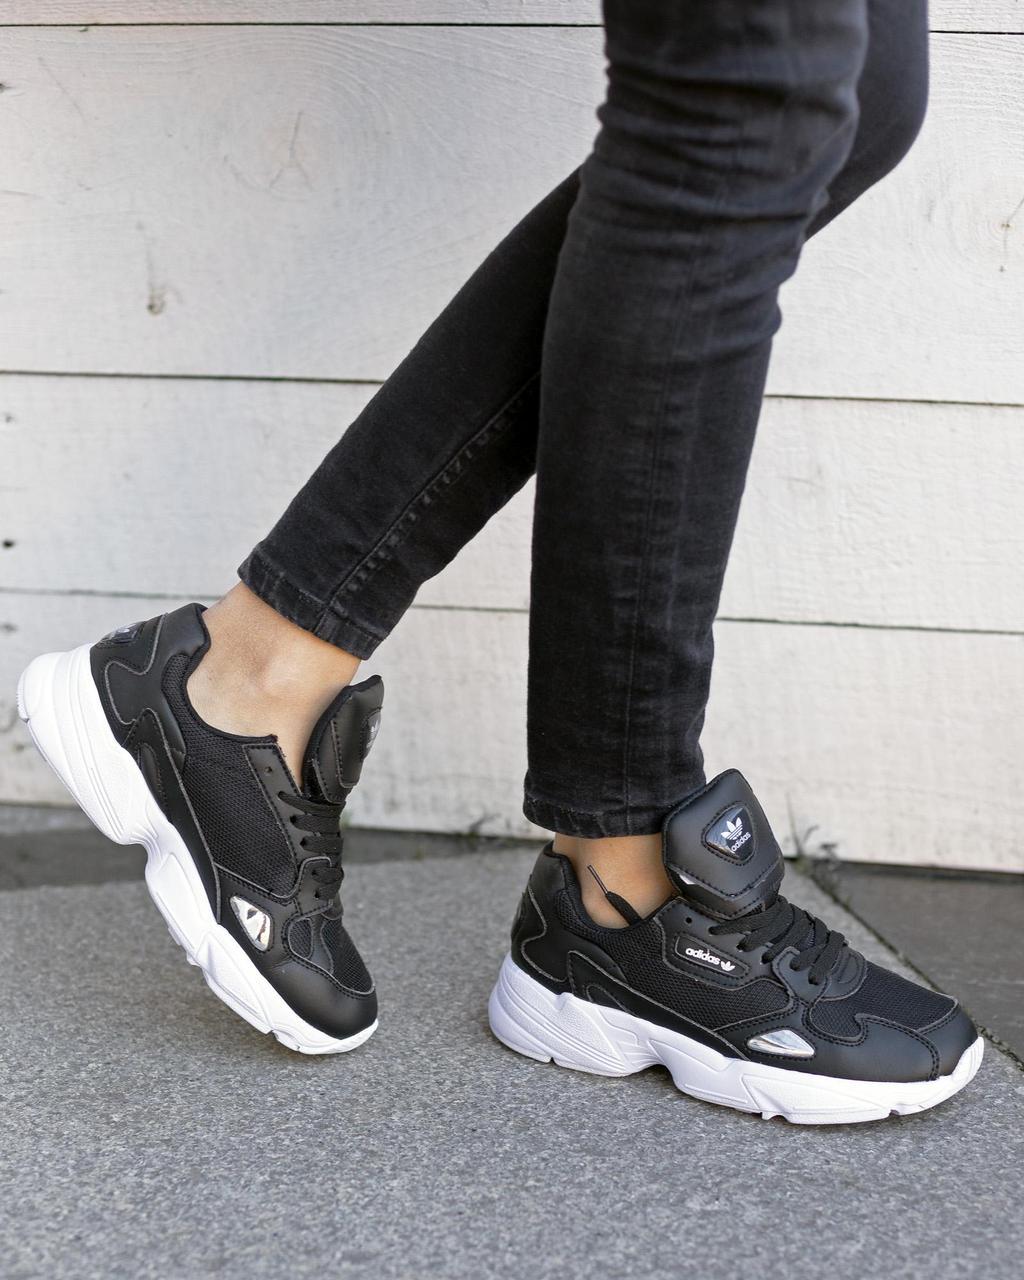 Кроссовки в стиле Falcon Leather